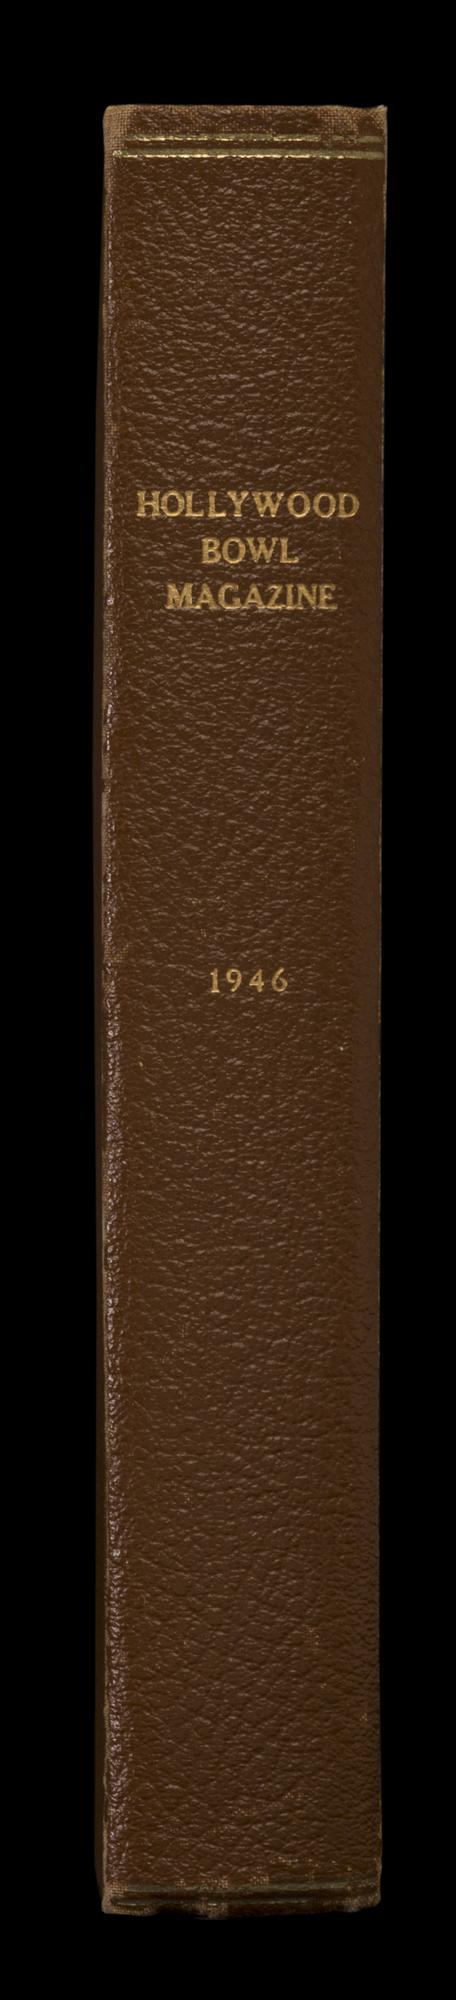 HB_ProgramBook_Spine_1946.jpg